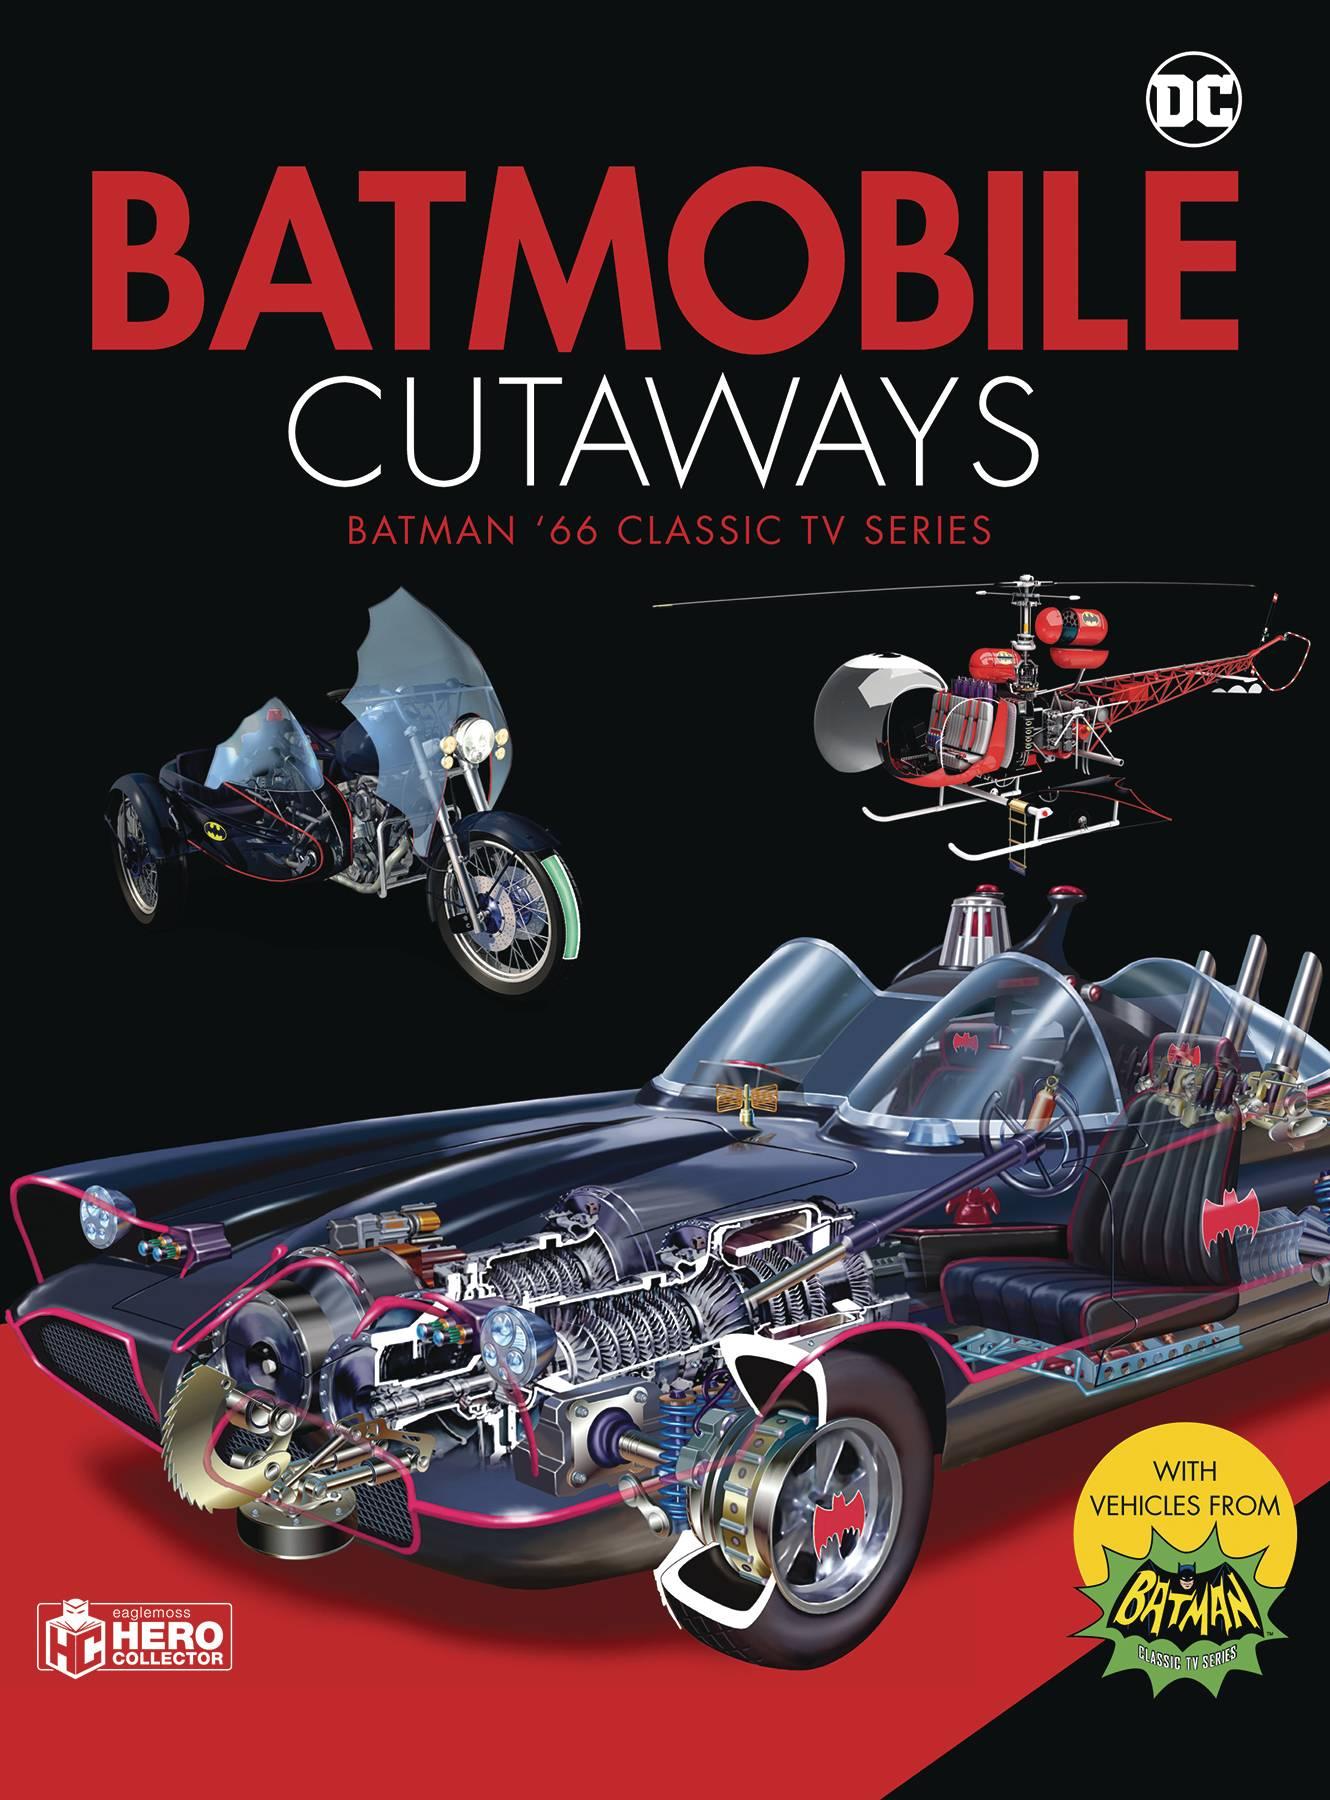 BATMOBILE CUTAWAYS CLASSIC BATMAN 66 TV SERIES w/ COLLECTIBLE